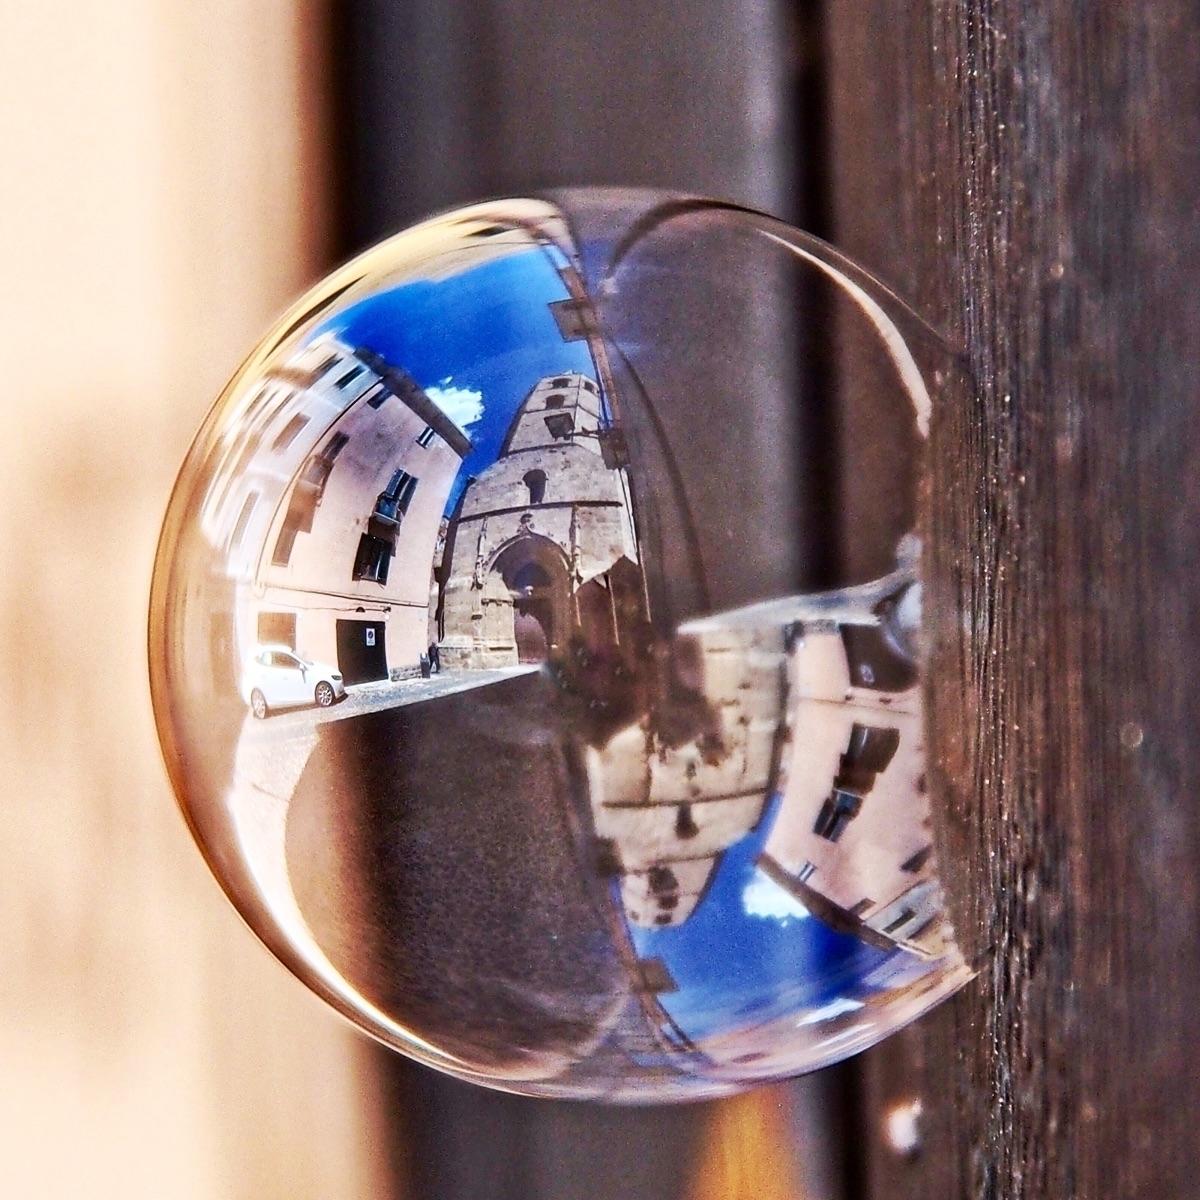 Iridescent bubbles, transparent - kyphotos | ello